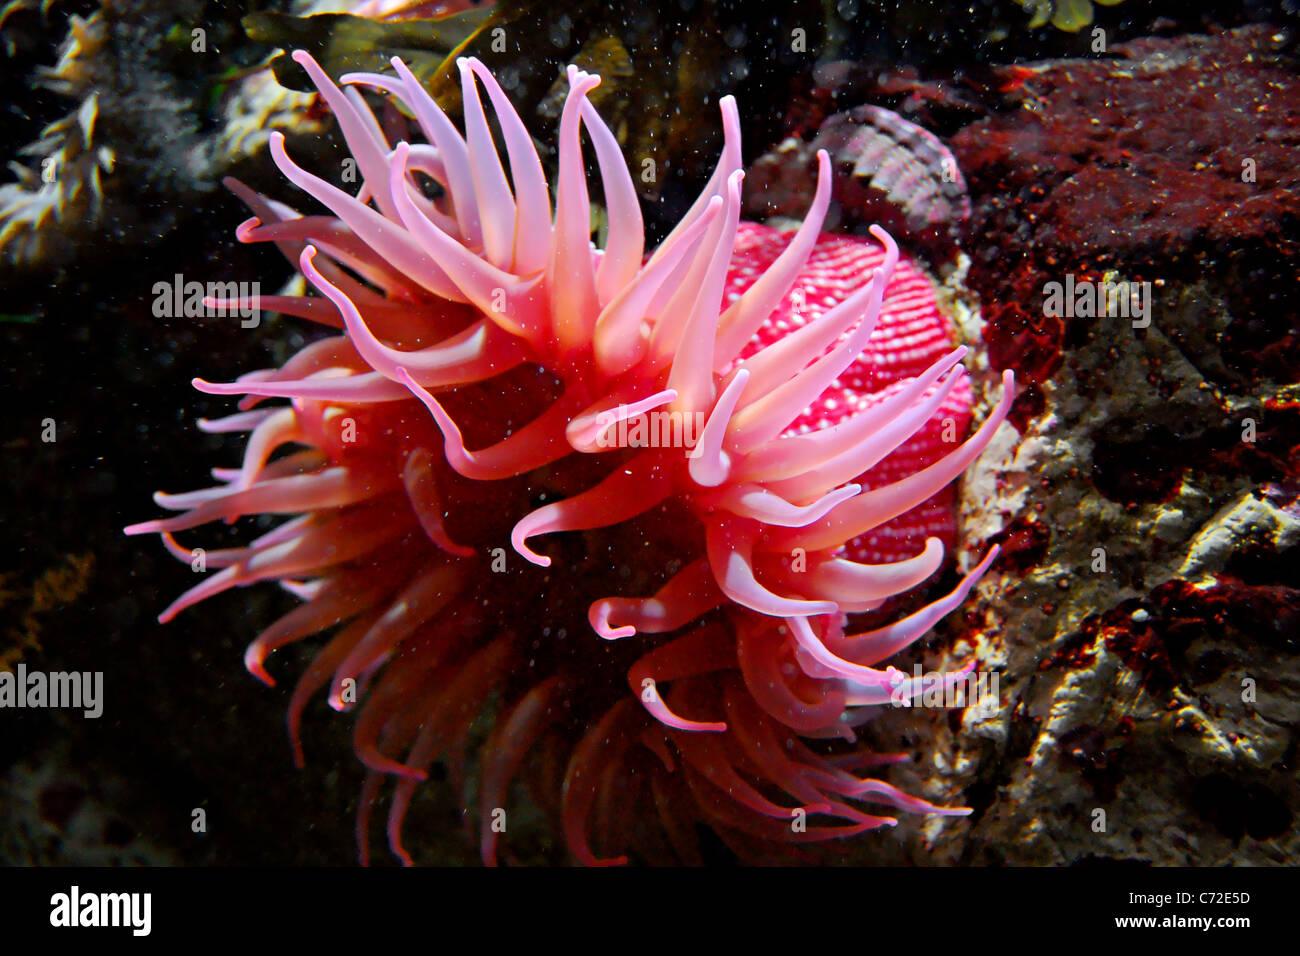 sea anemone monterey bay aquarium california stock photo